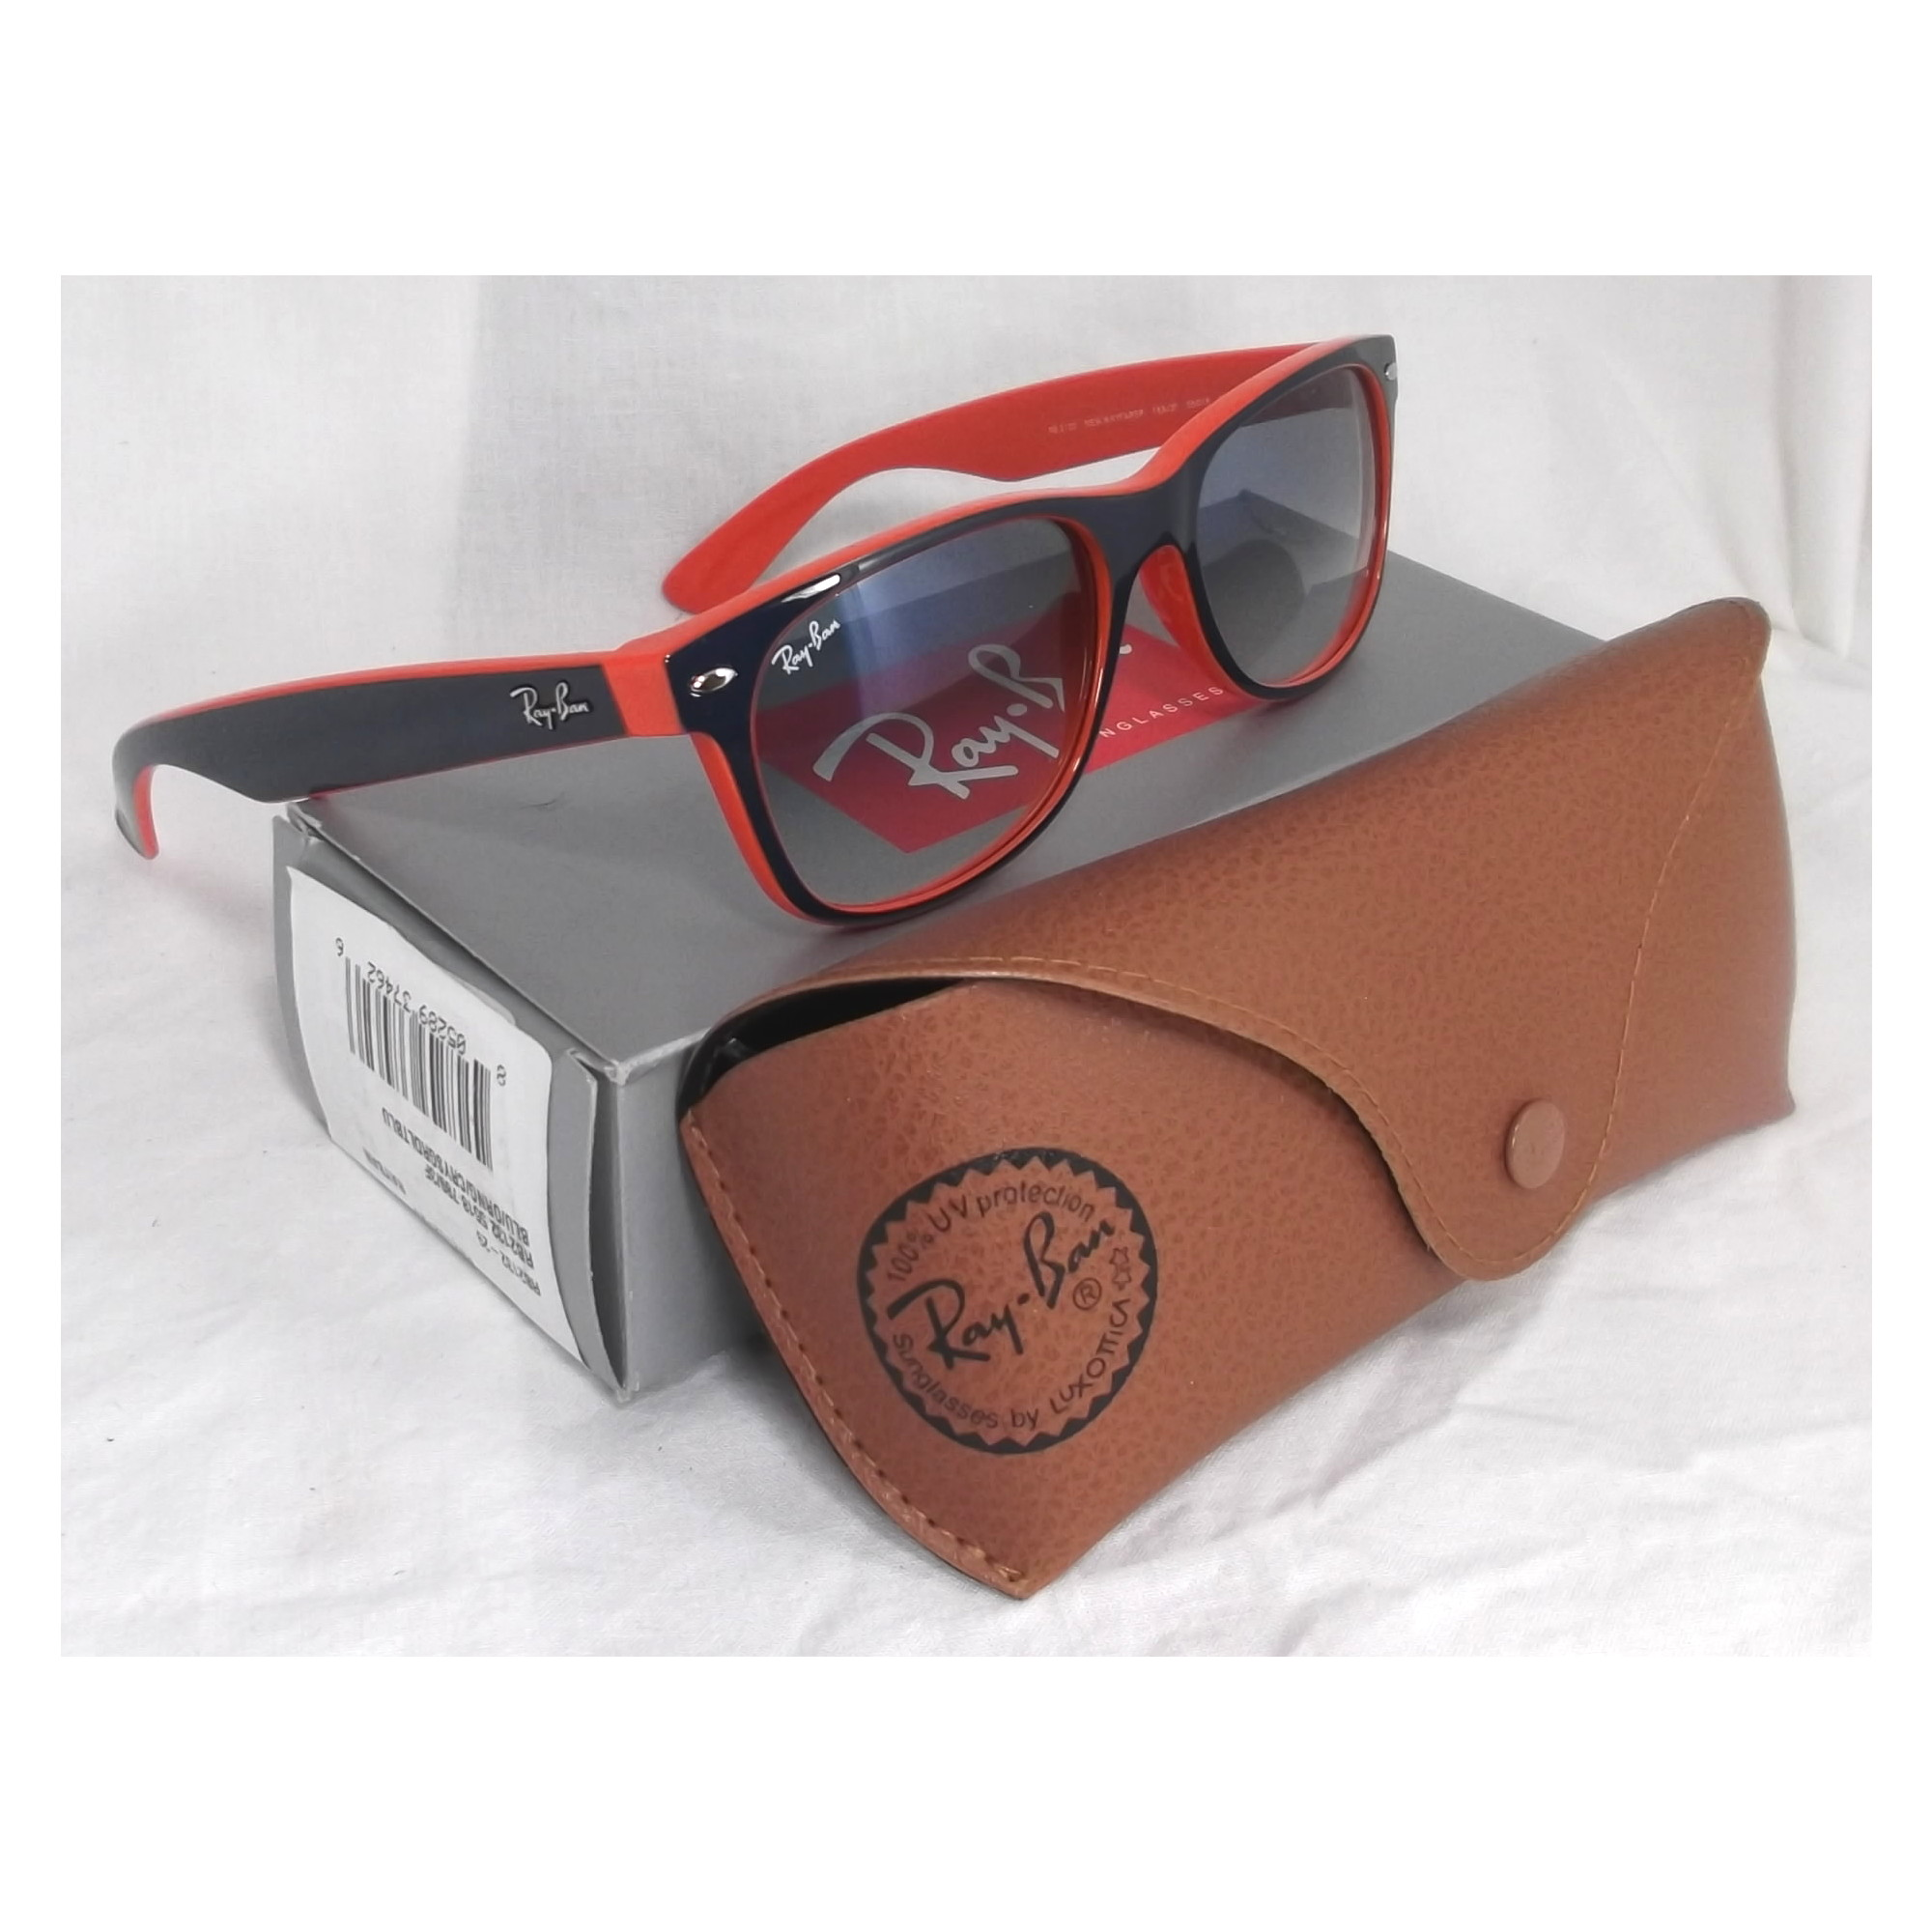 91ecaa69b01 Ray Ban Sunglasses Blue Orange